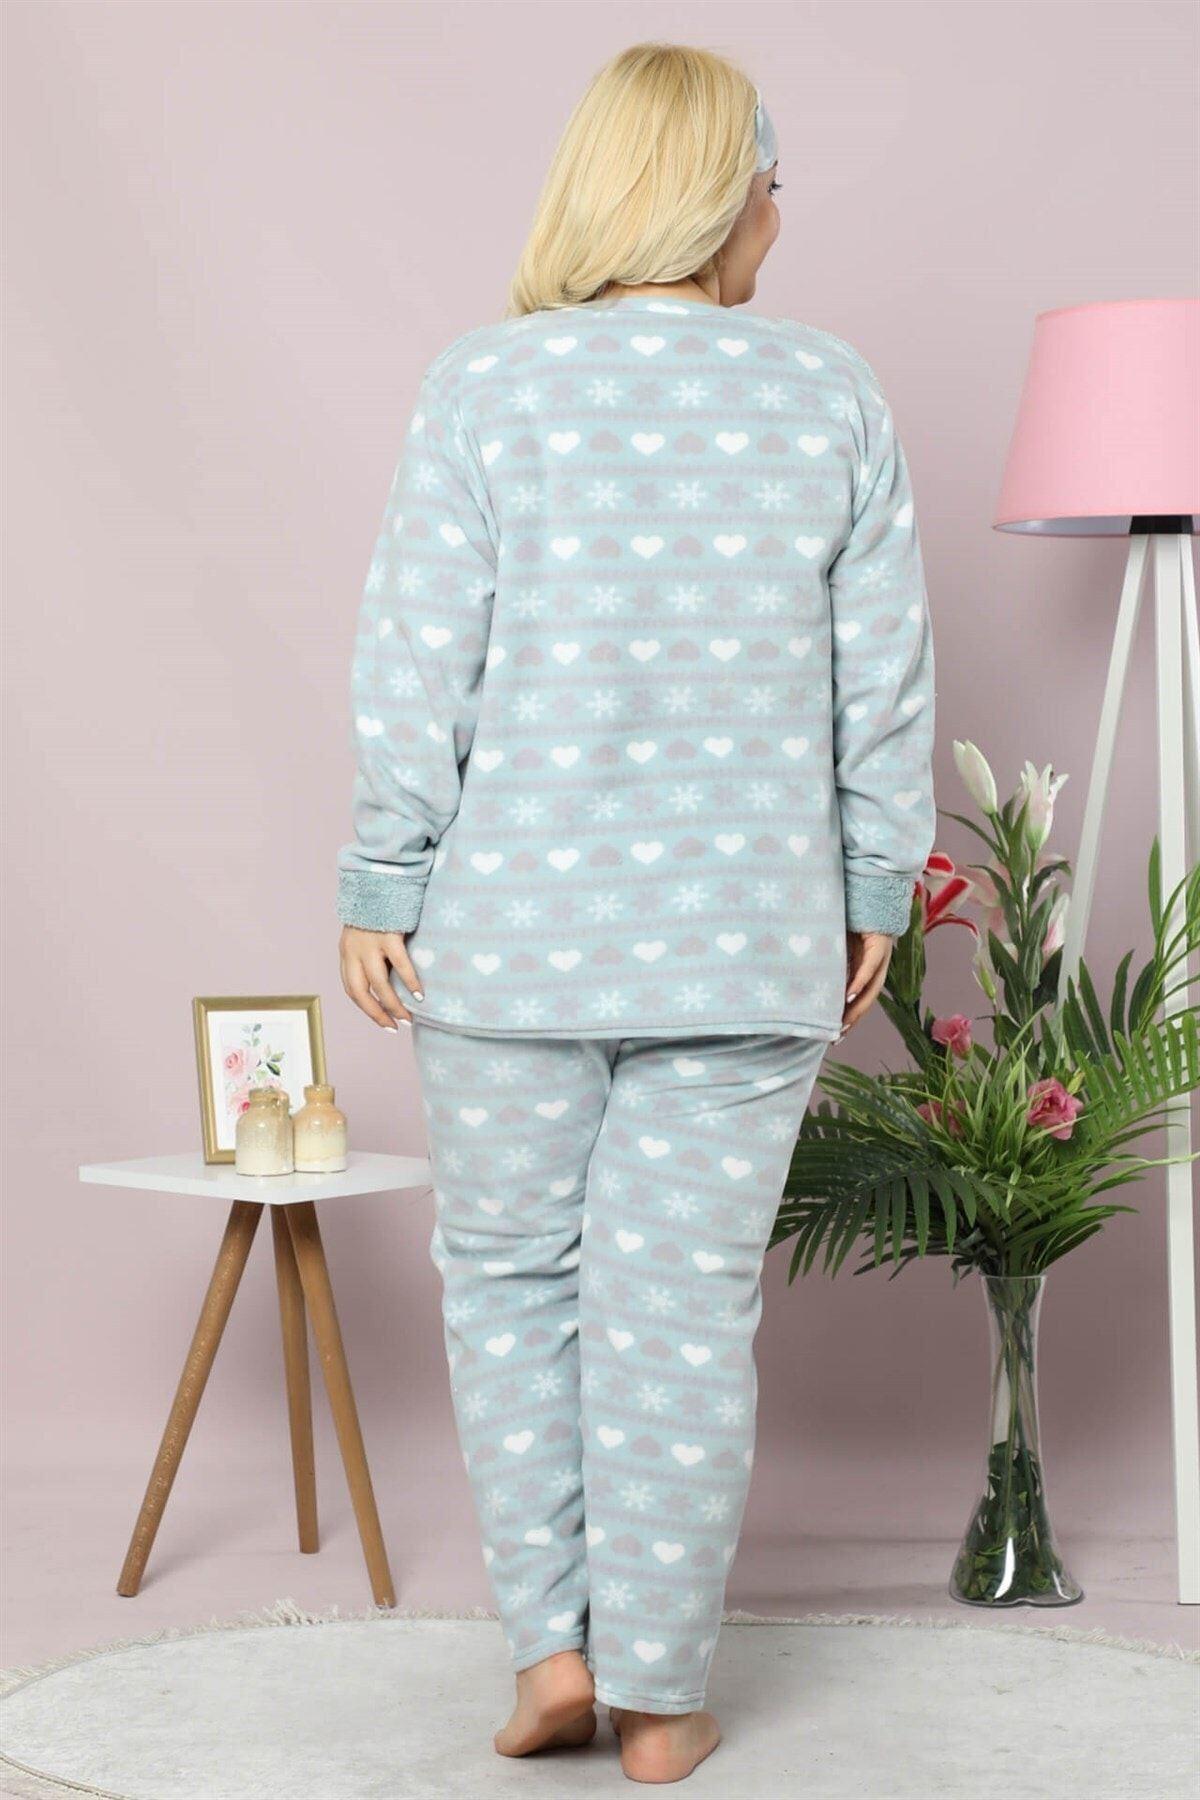 Welsoft Polar Pijama Takımı 32C-9016